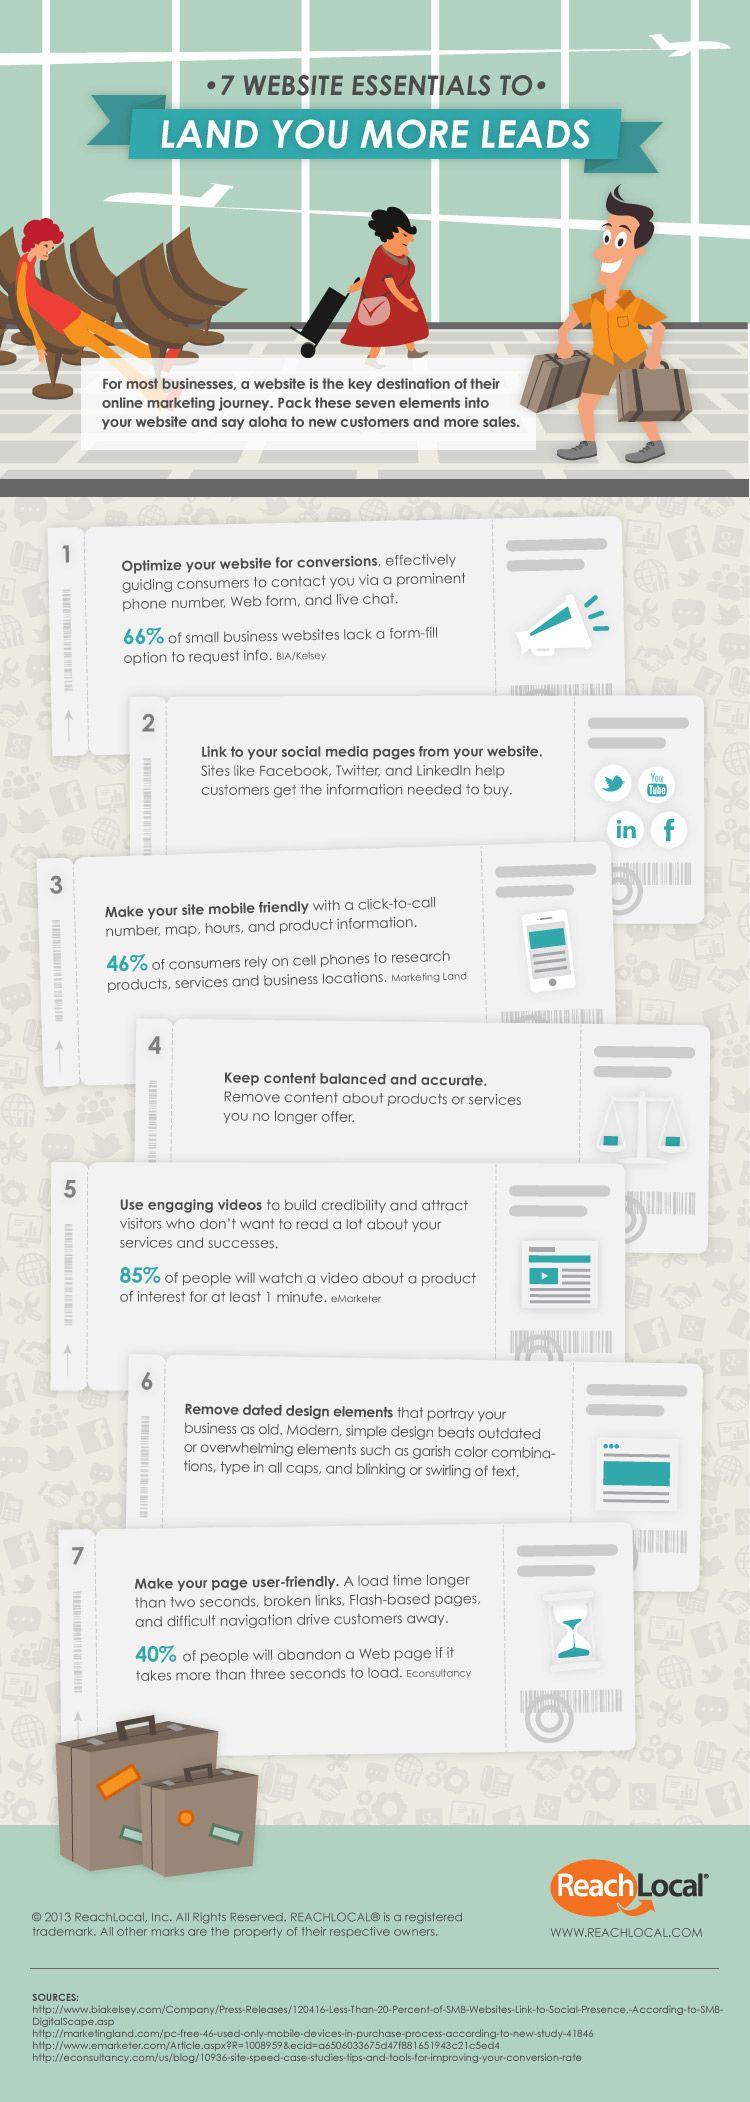 7 Website Essentials To Land More Sales Infographic Digital